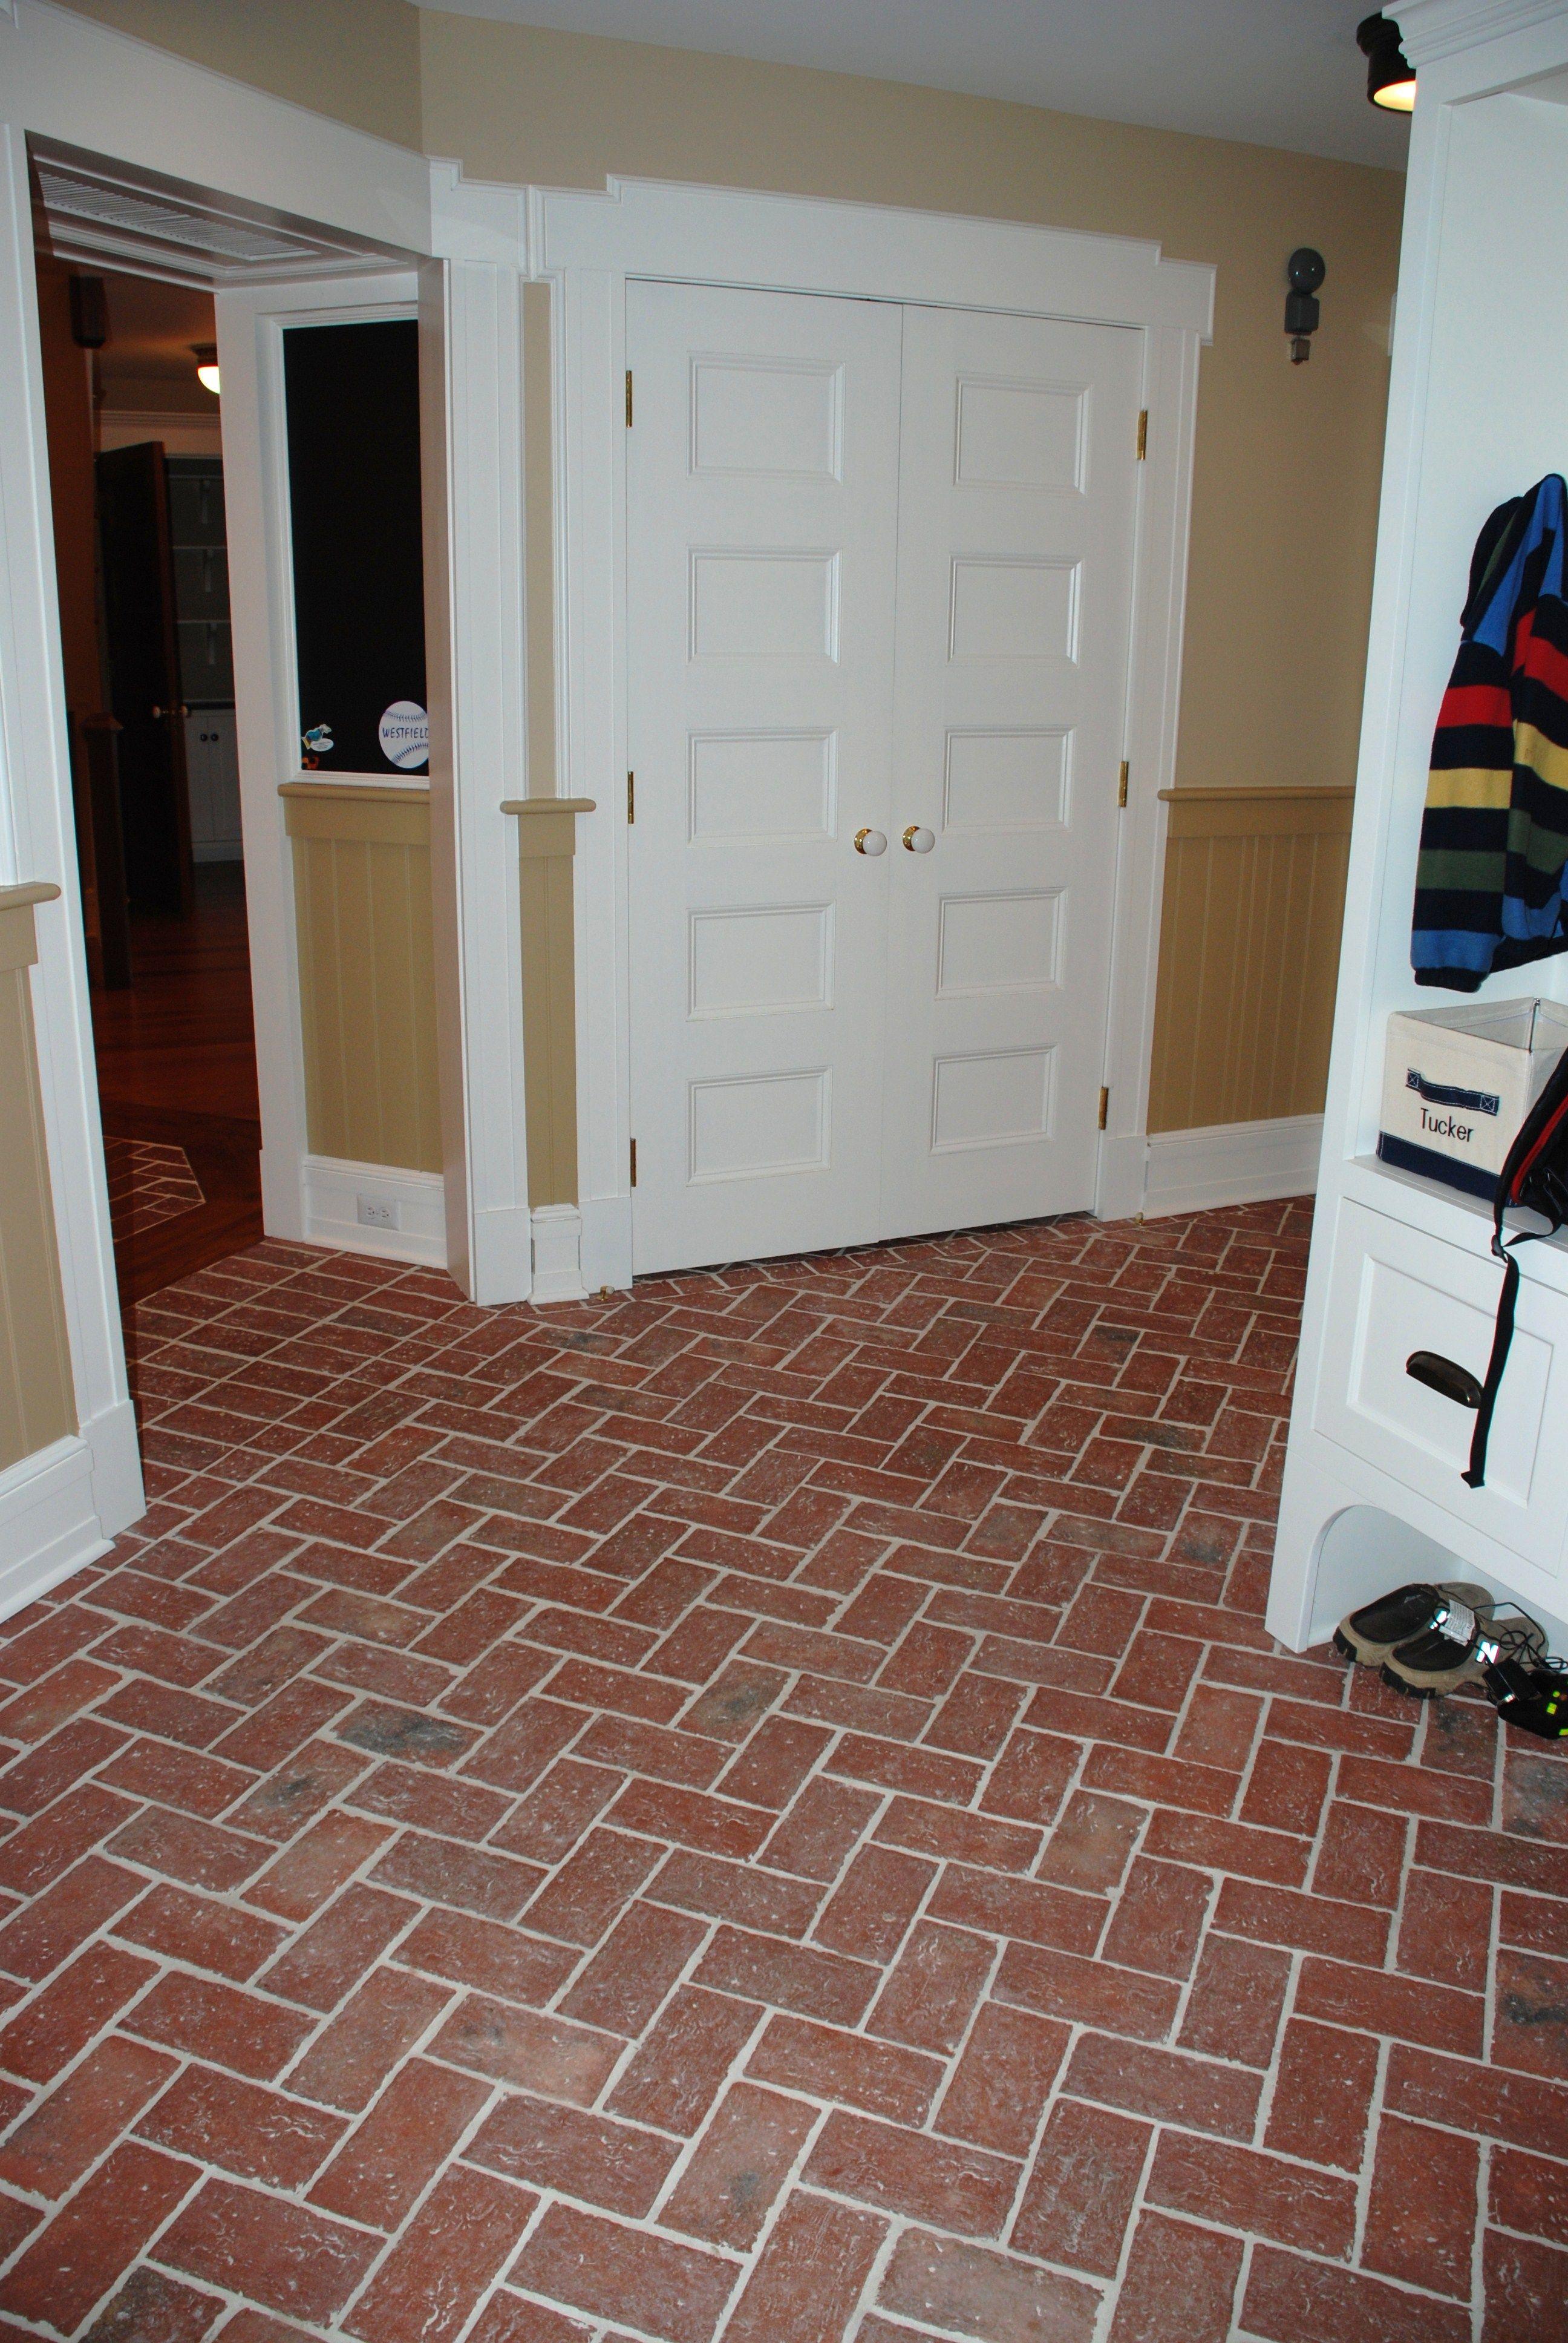 A spacious entry hall floor traditional antique in marietta color entryways and hallways inglenook brick tiles thin brick flooring brick pavers ceramic brick tiles brick floors dailygadgetfo Images